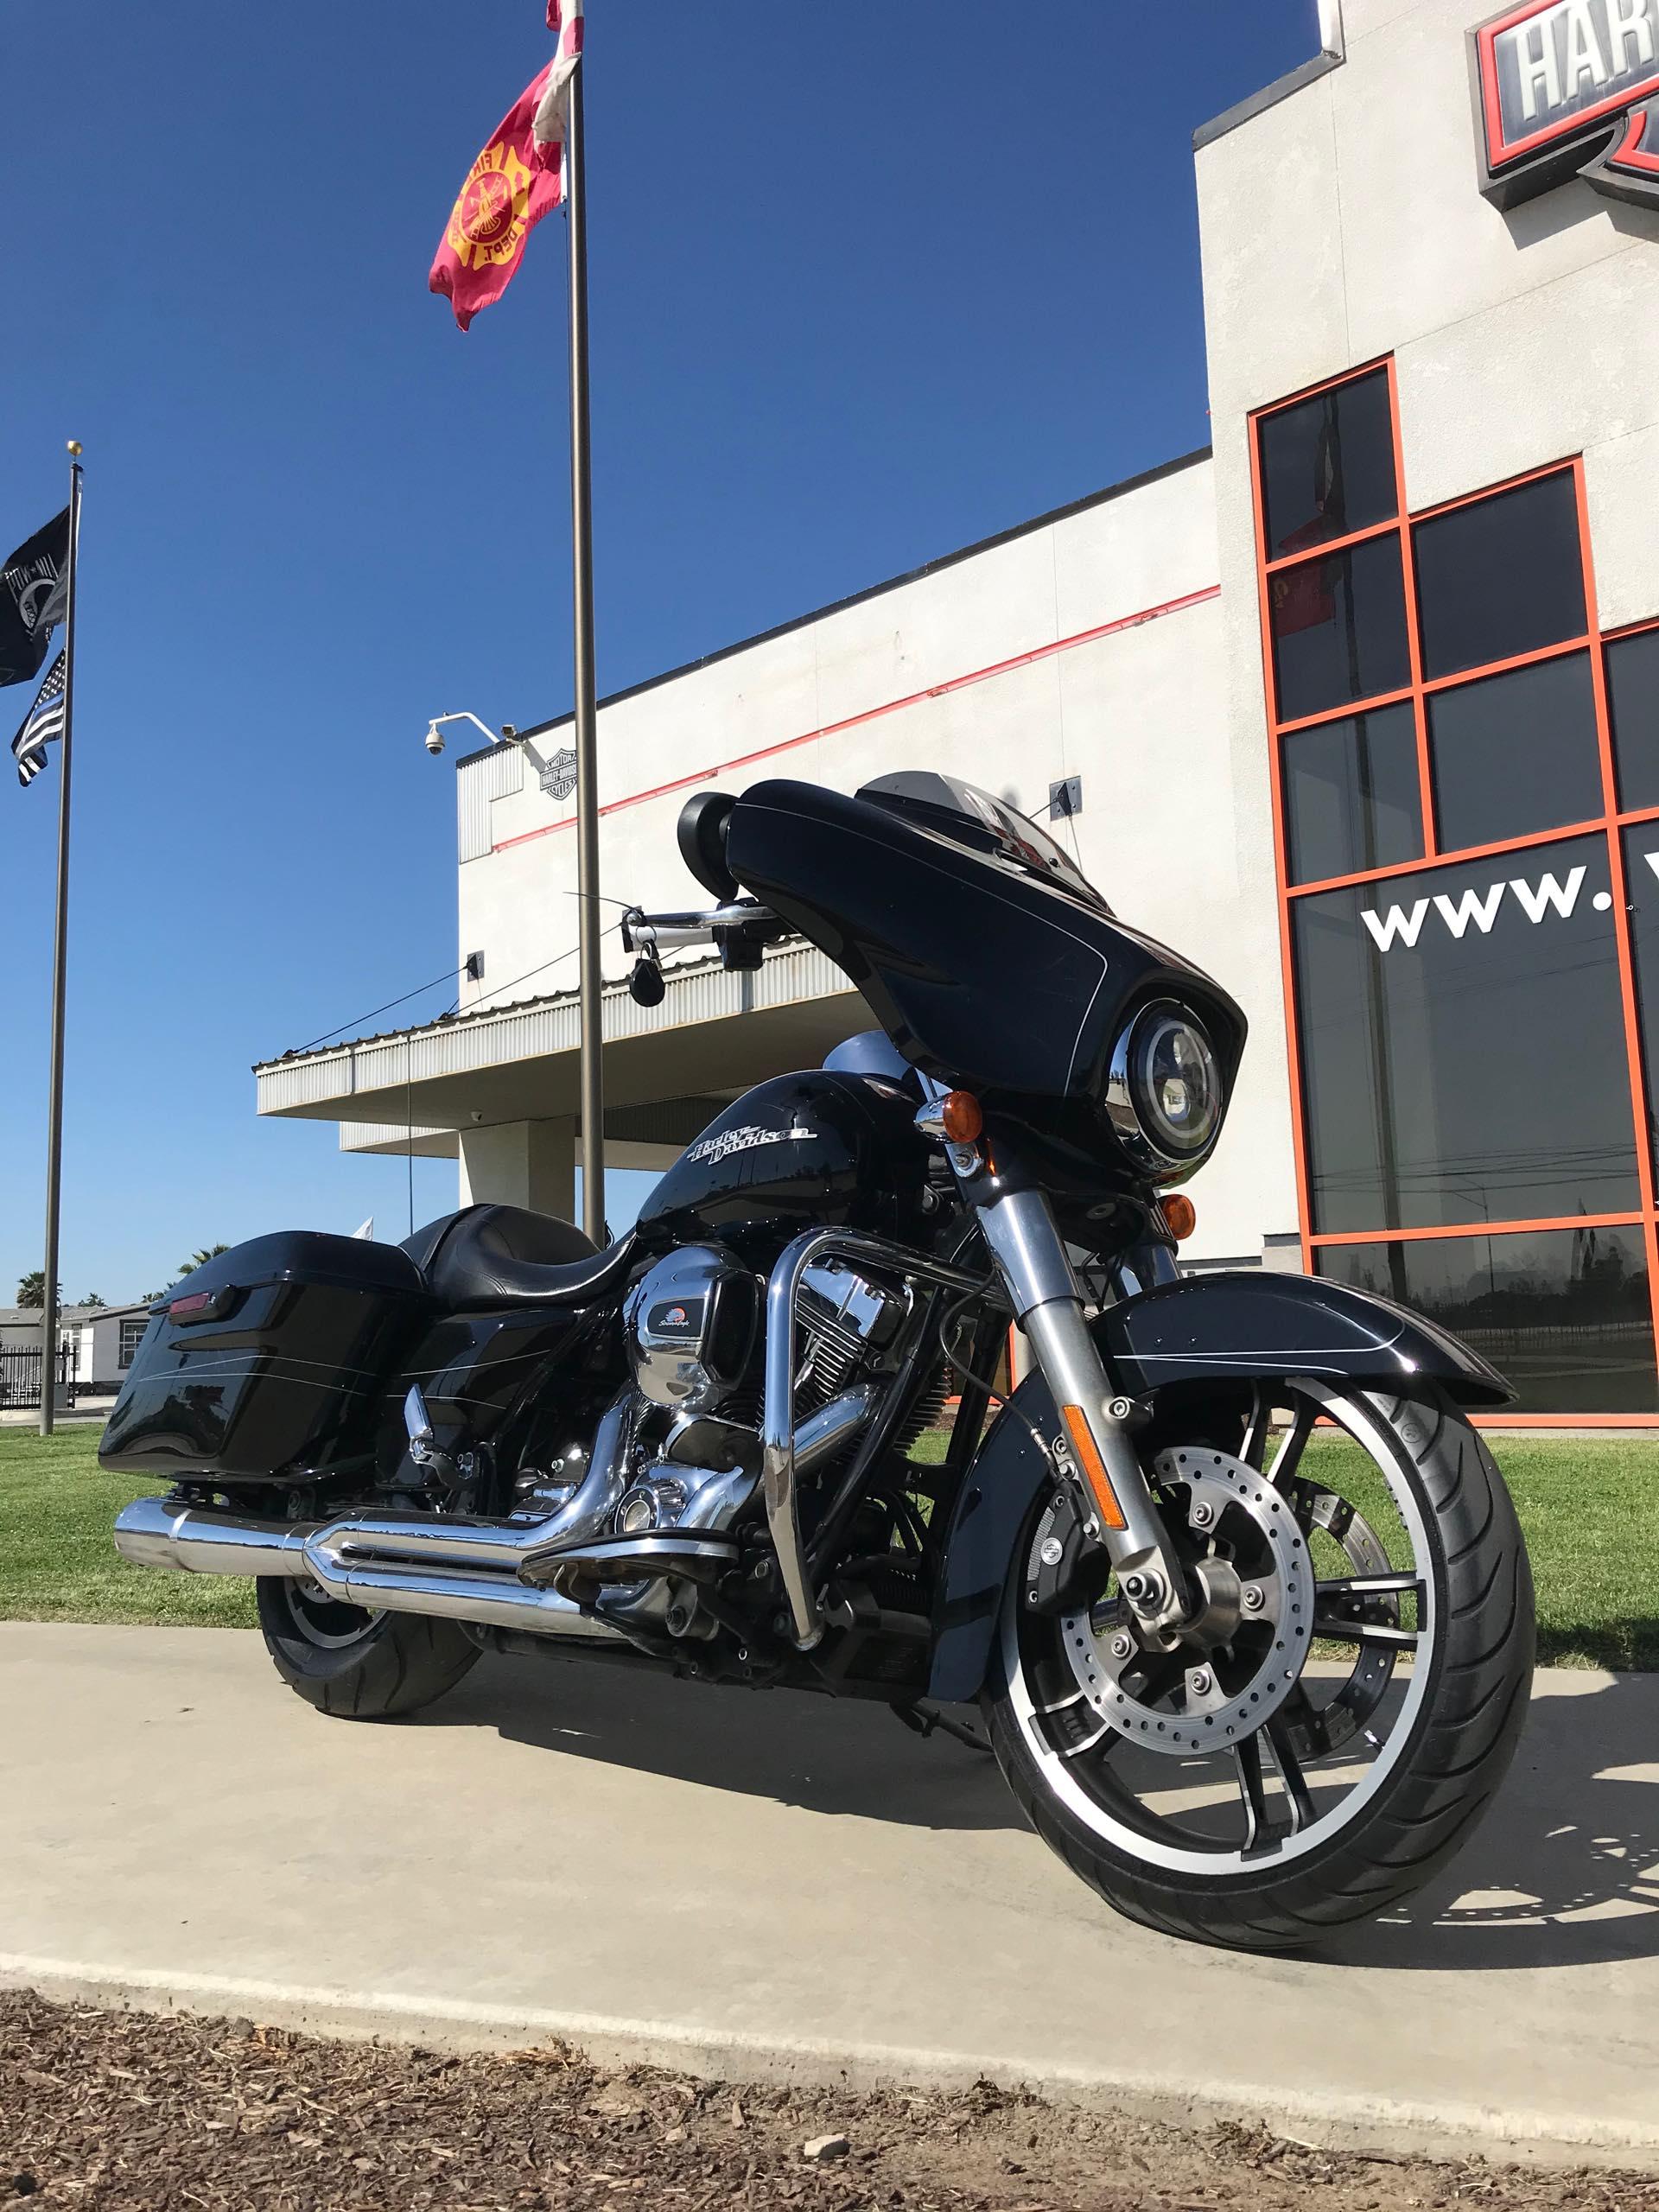 2014 Harley-Davidson Street Glide Special at Visalia Harley-Davidson